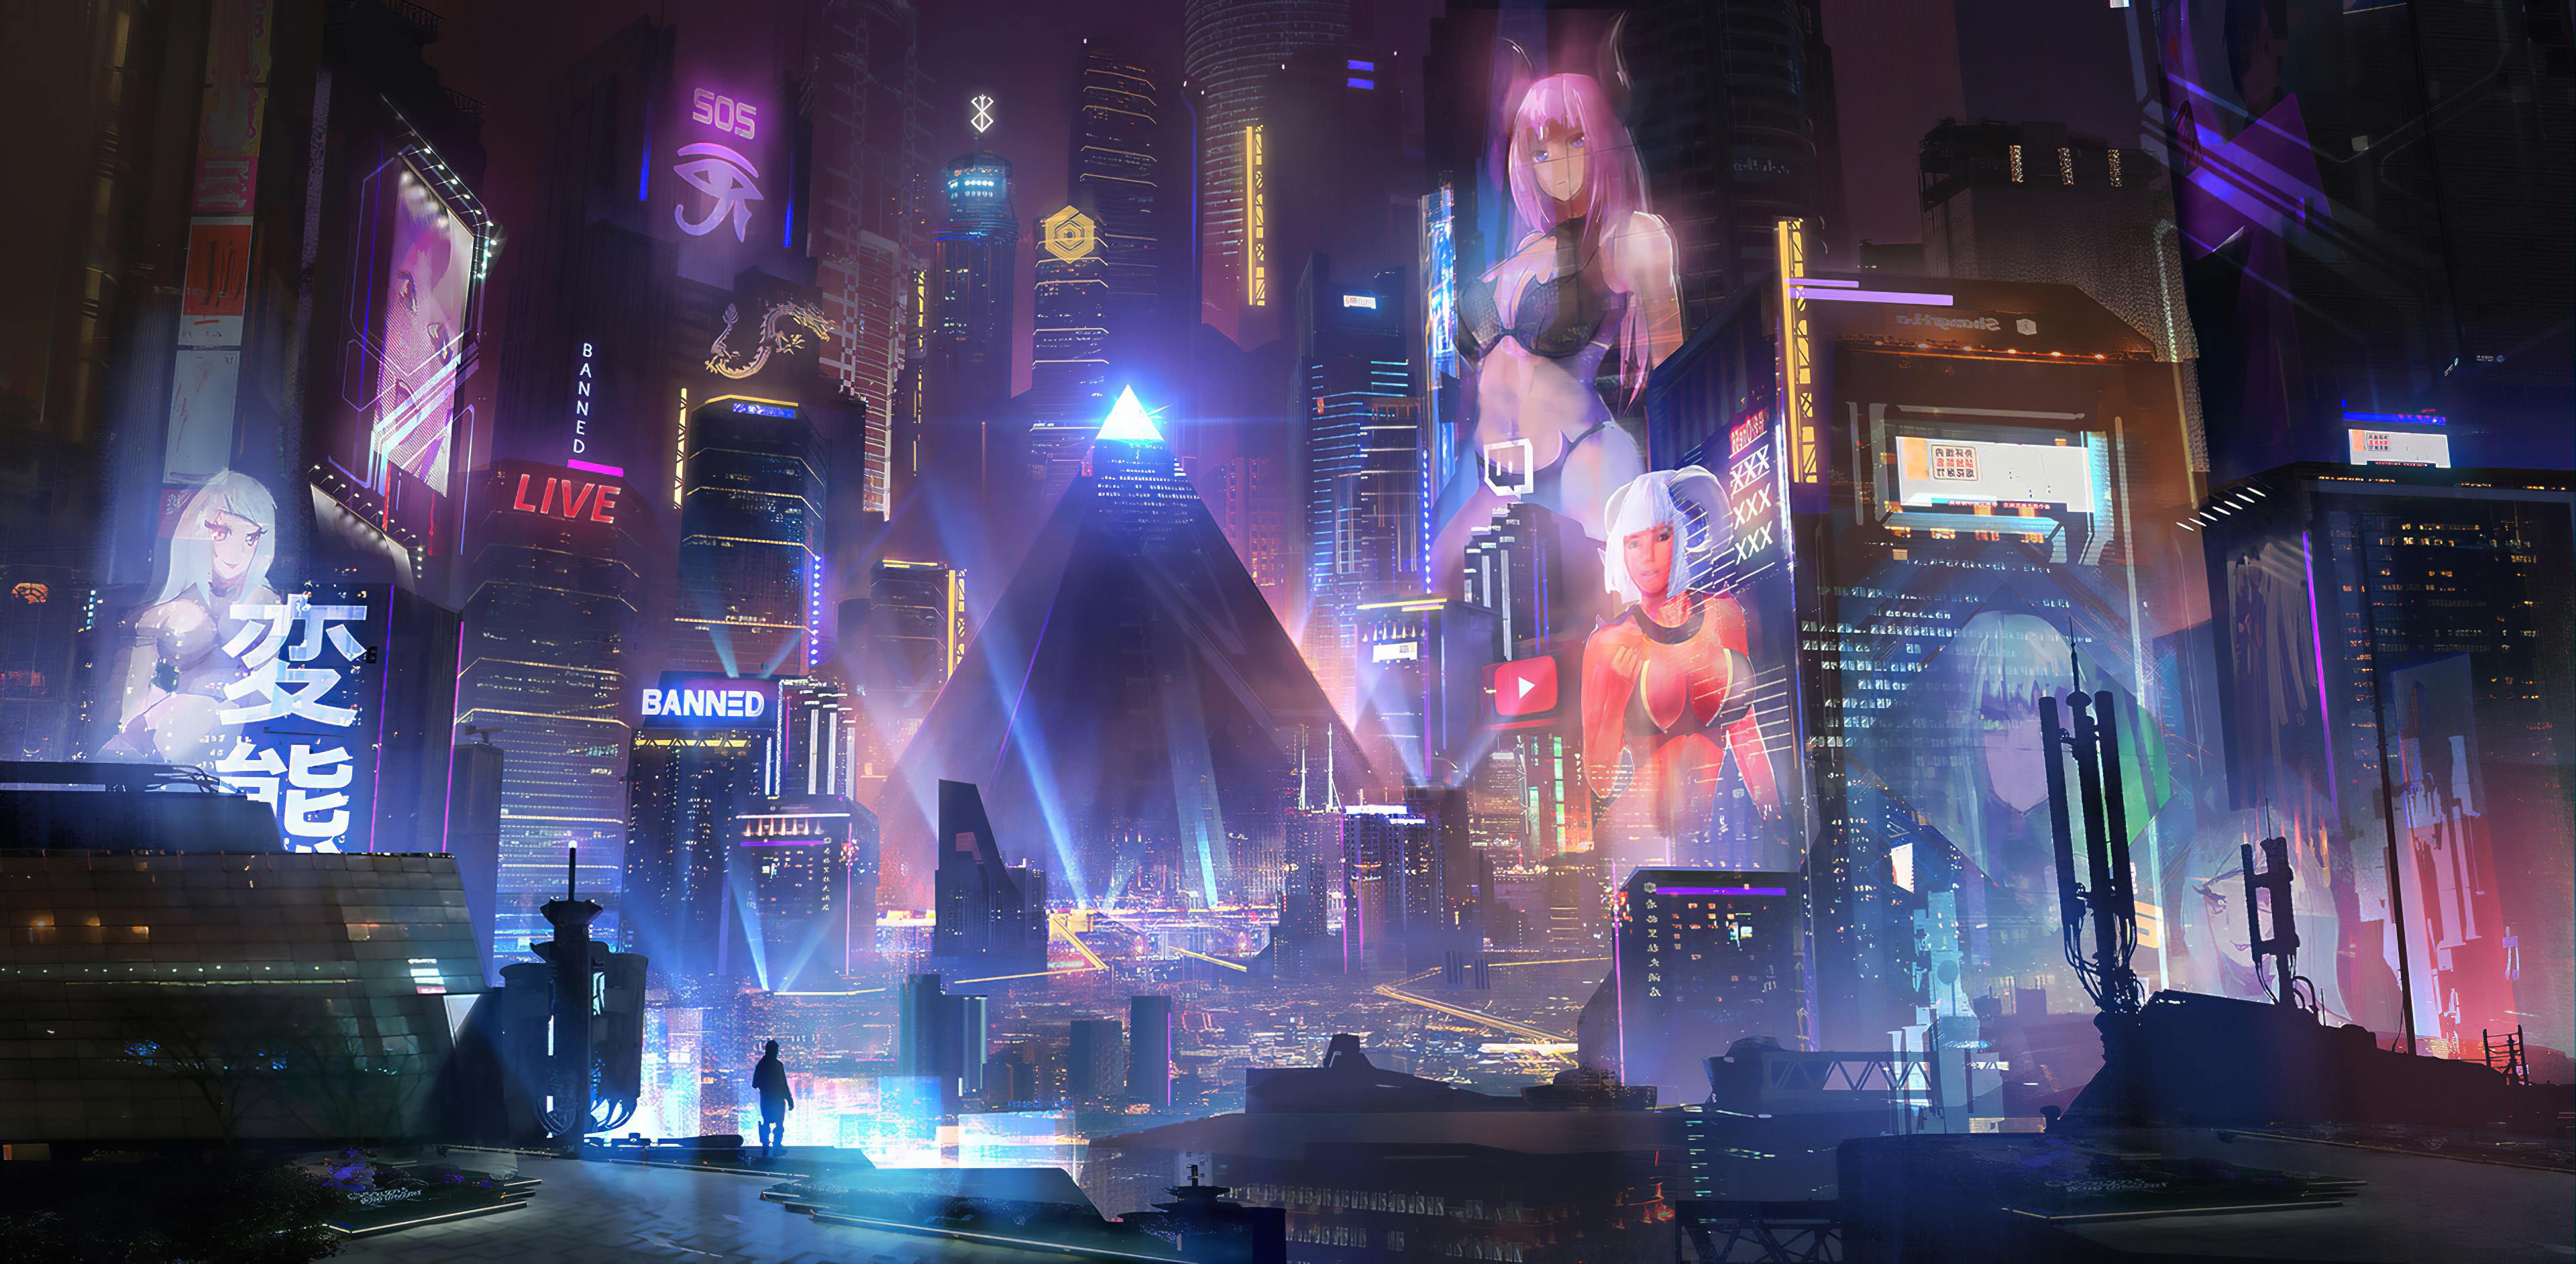 cyberpunk city 1574940837 - Cyberpunk City -